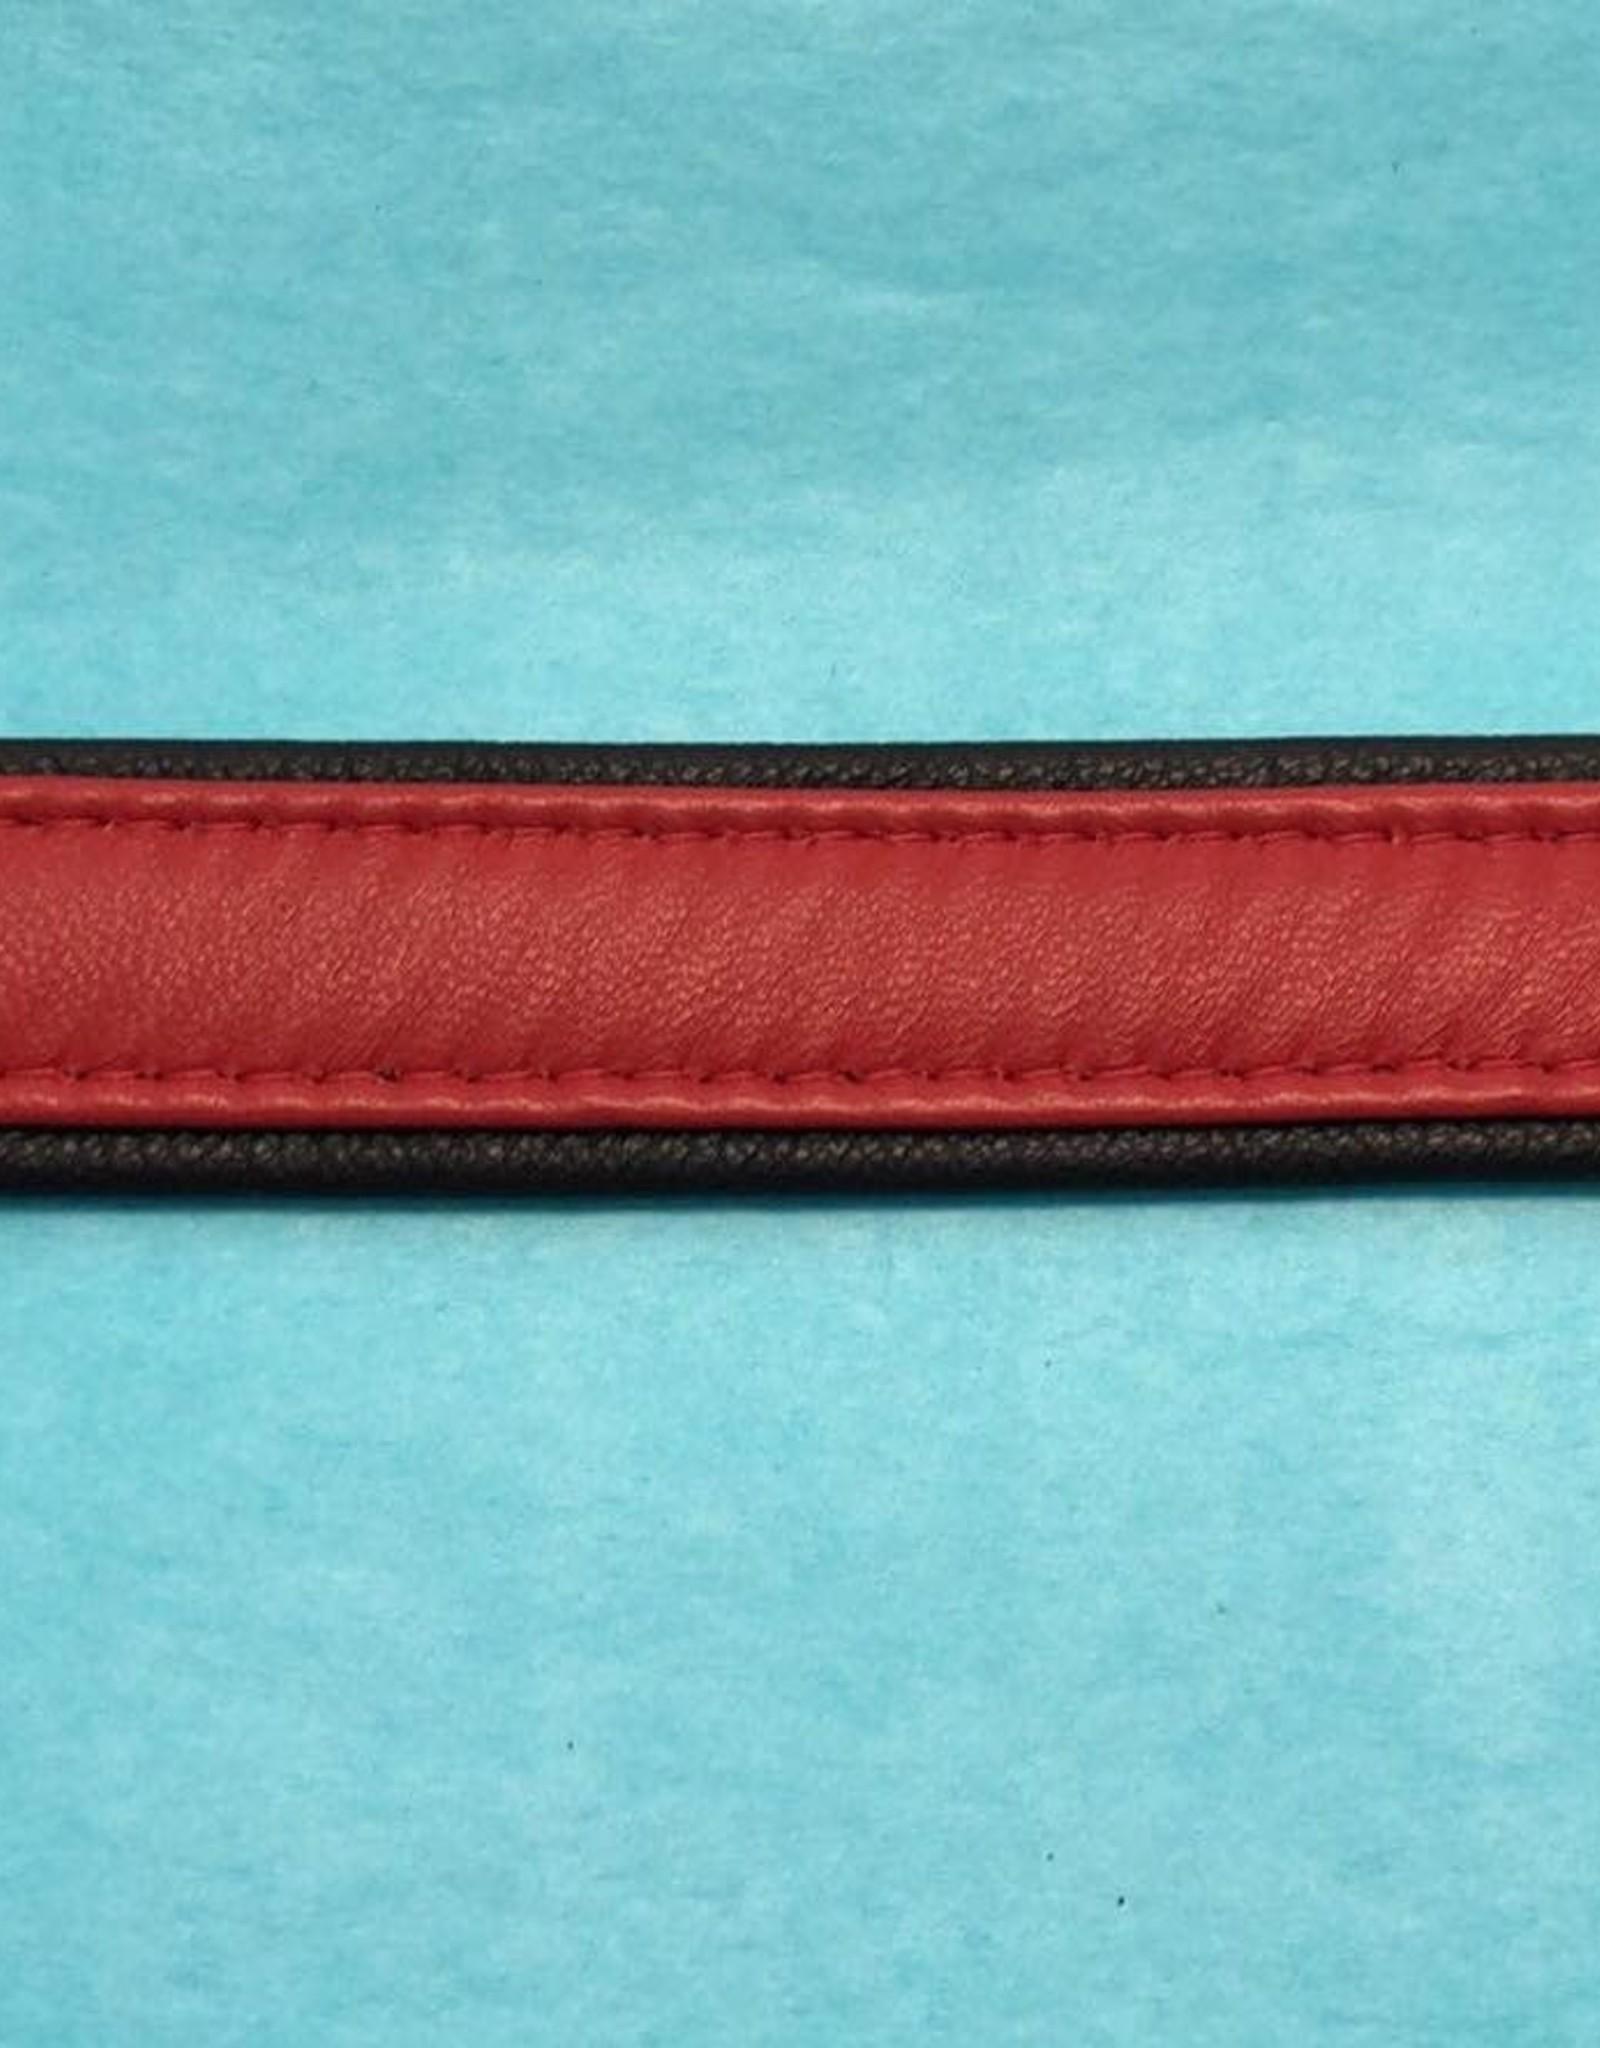 The Leather Union Wrist Band 1 1/4